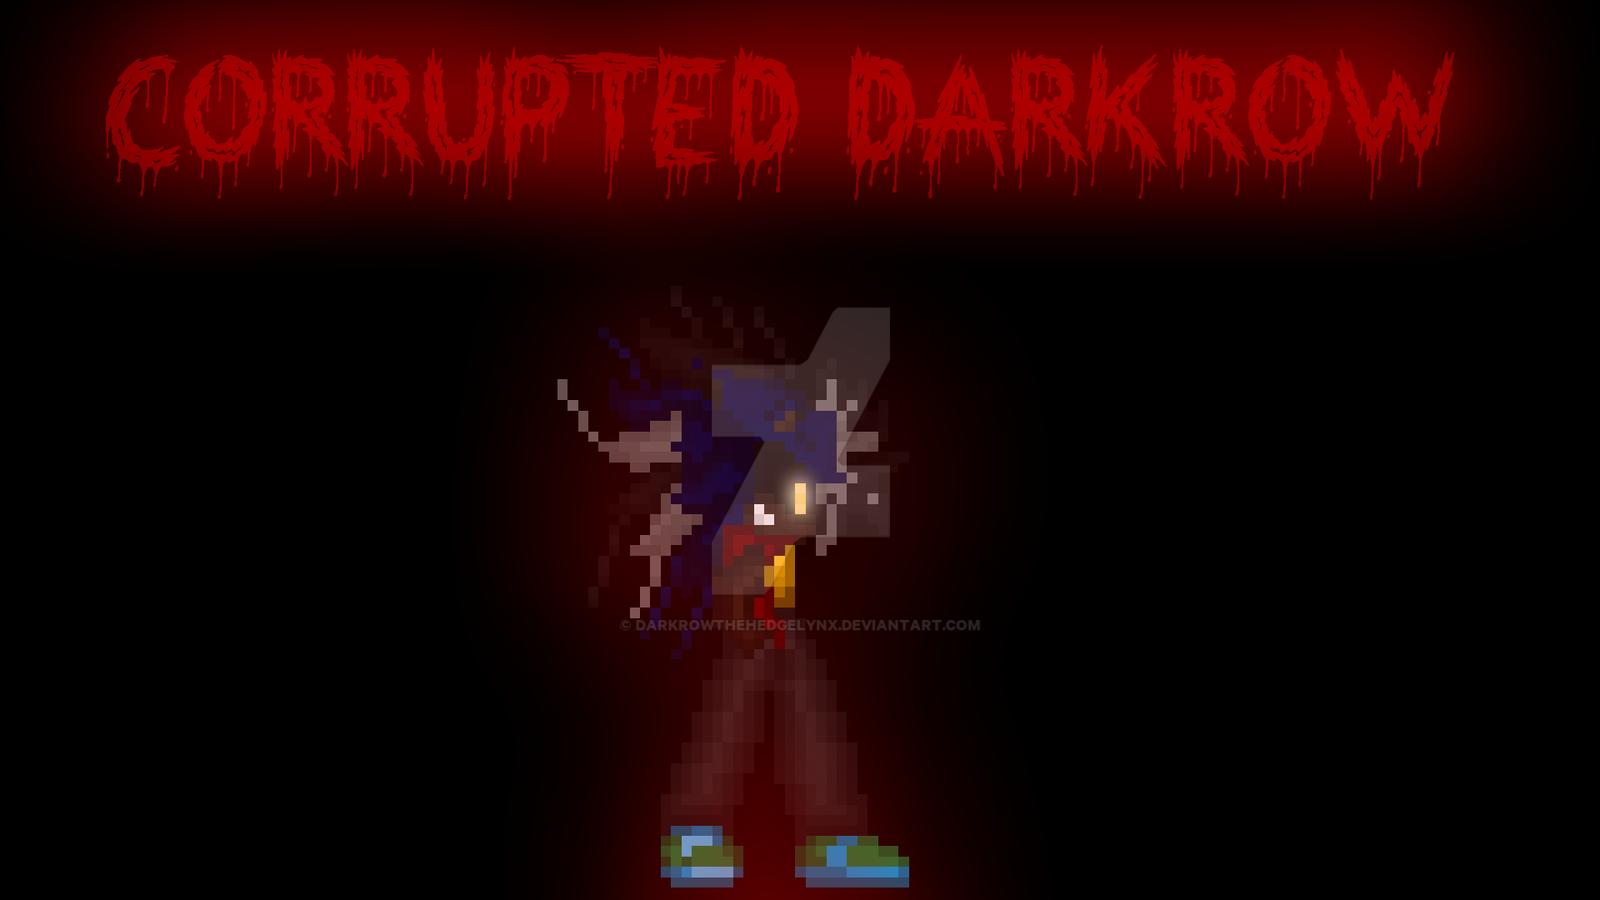 My Corrupted Form by DarkrowTheHedgelynx